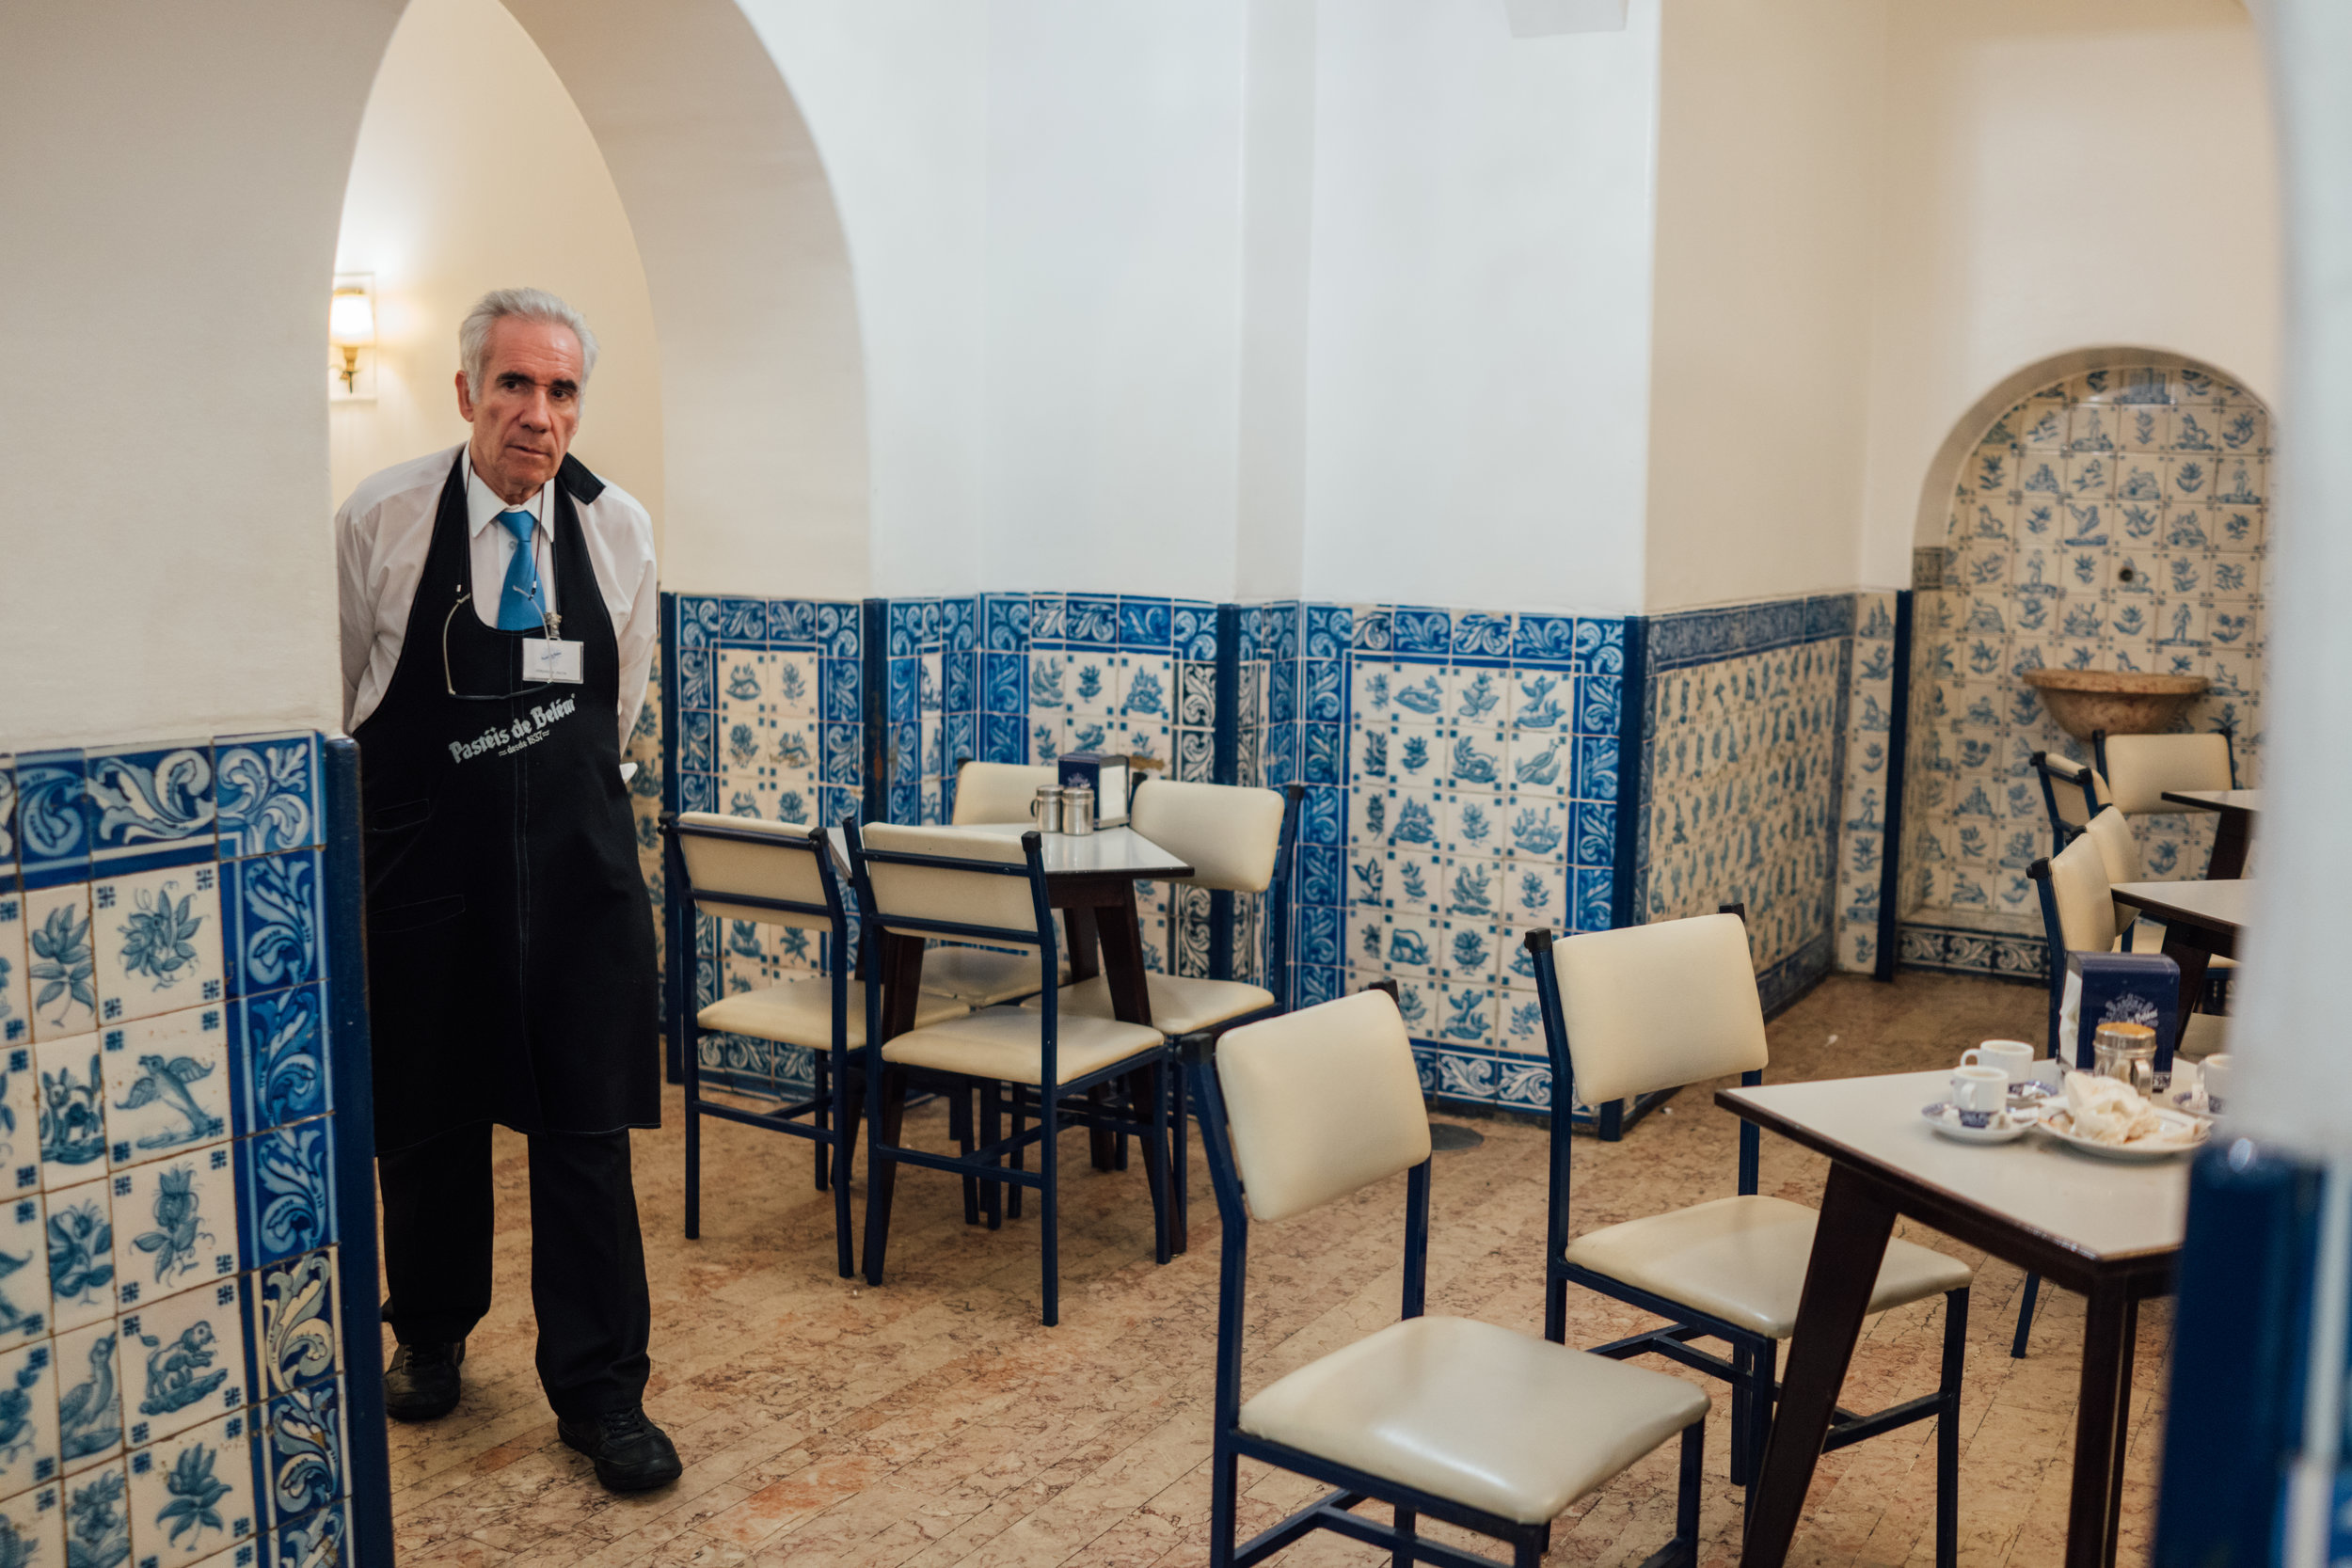 A rare quiet moment at Pastéis de Belém, near closing time